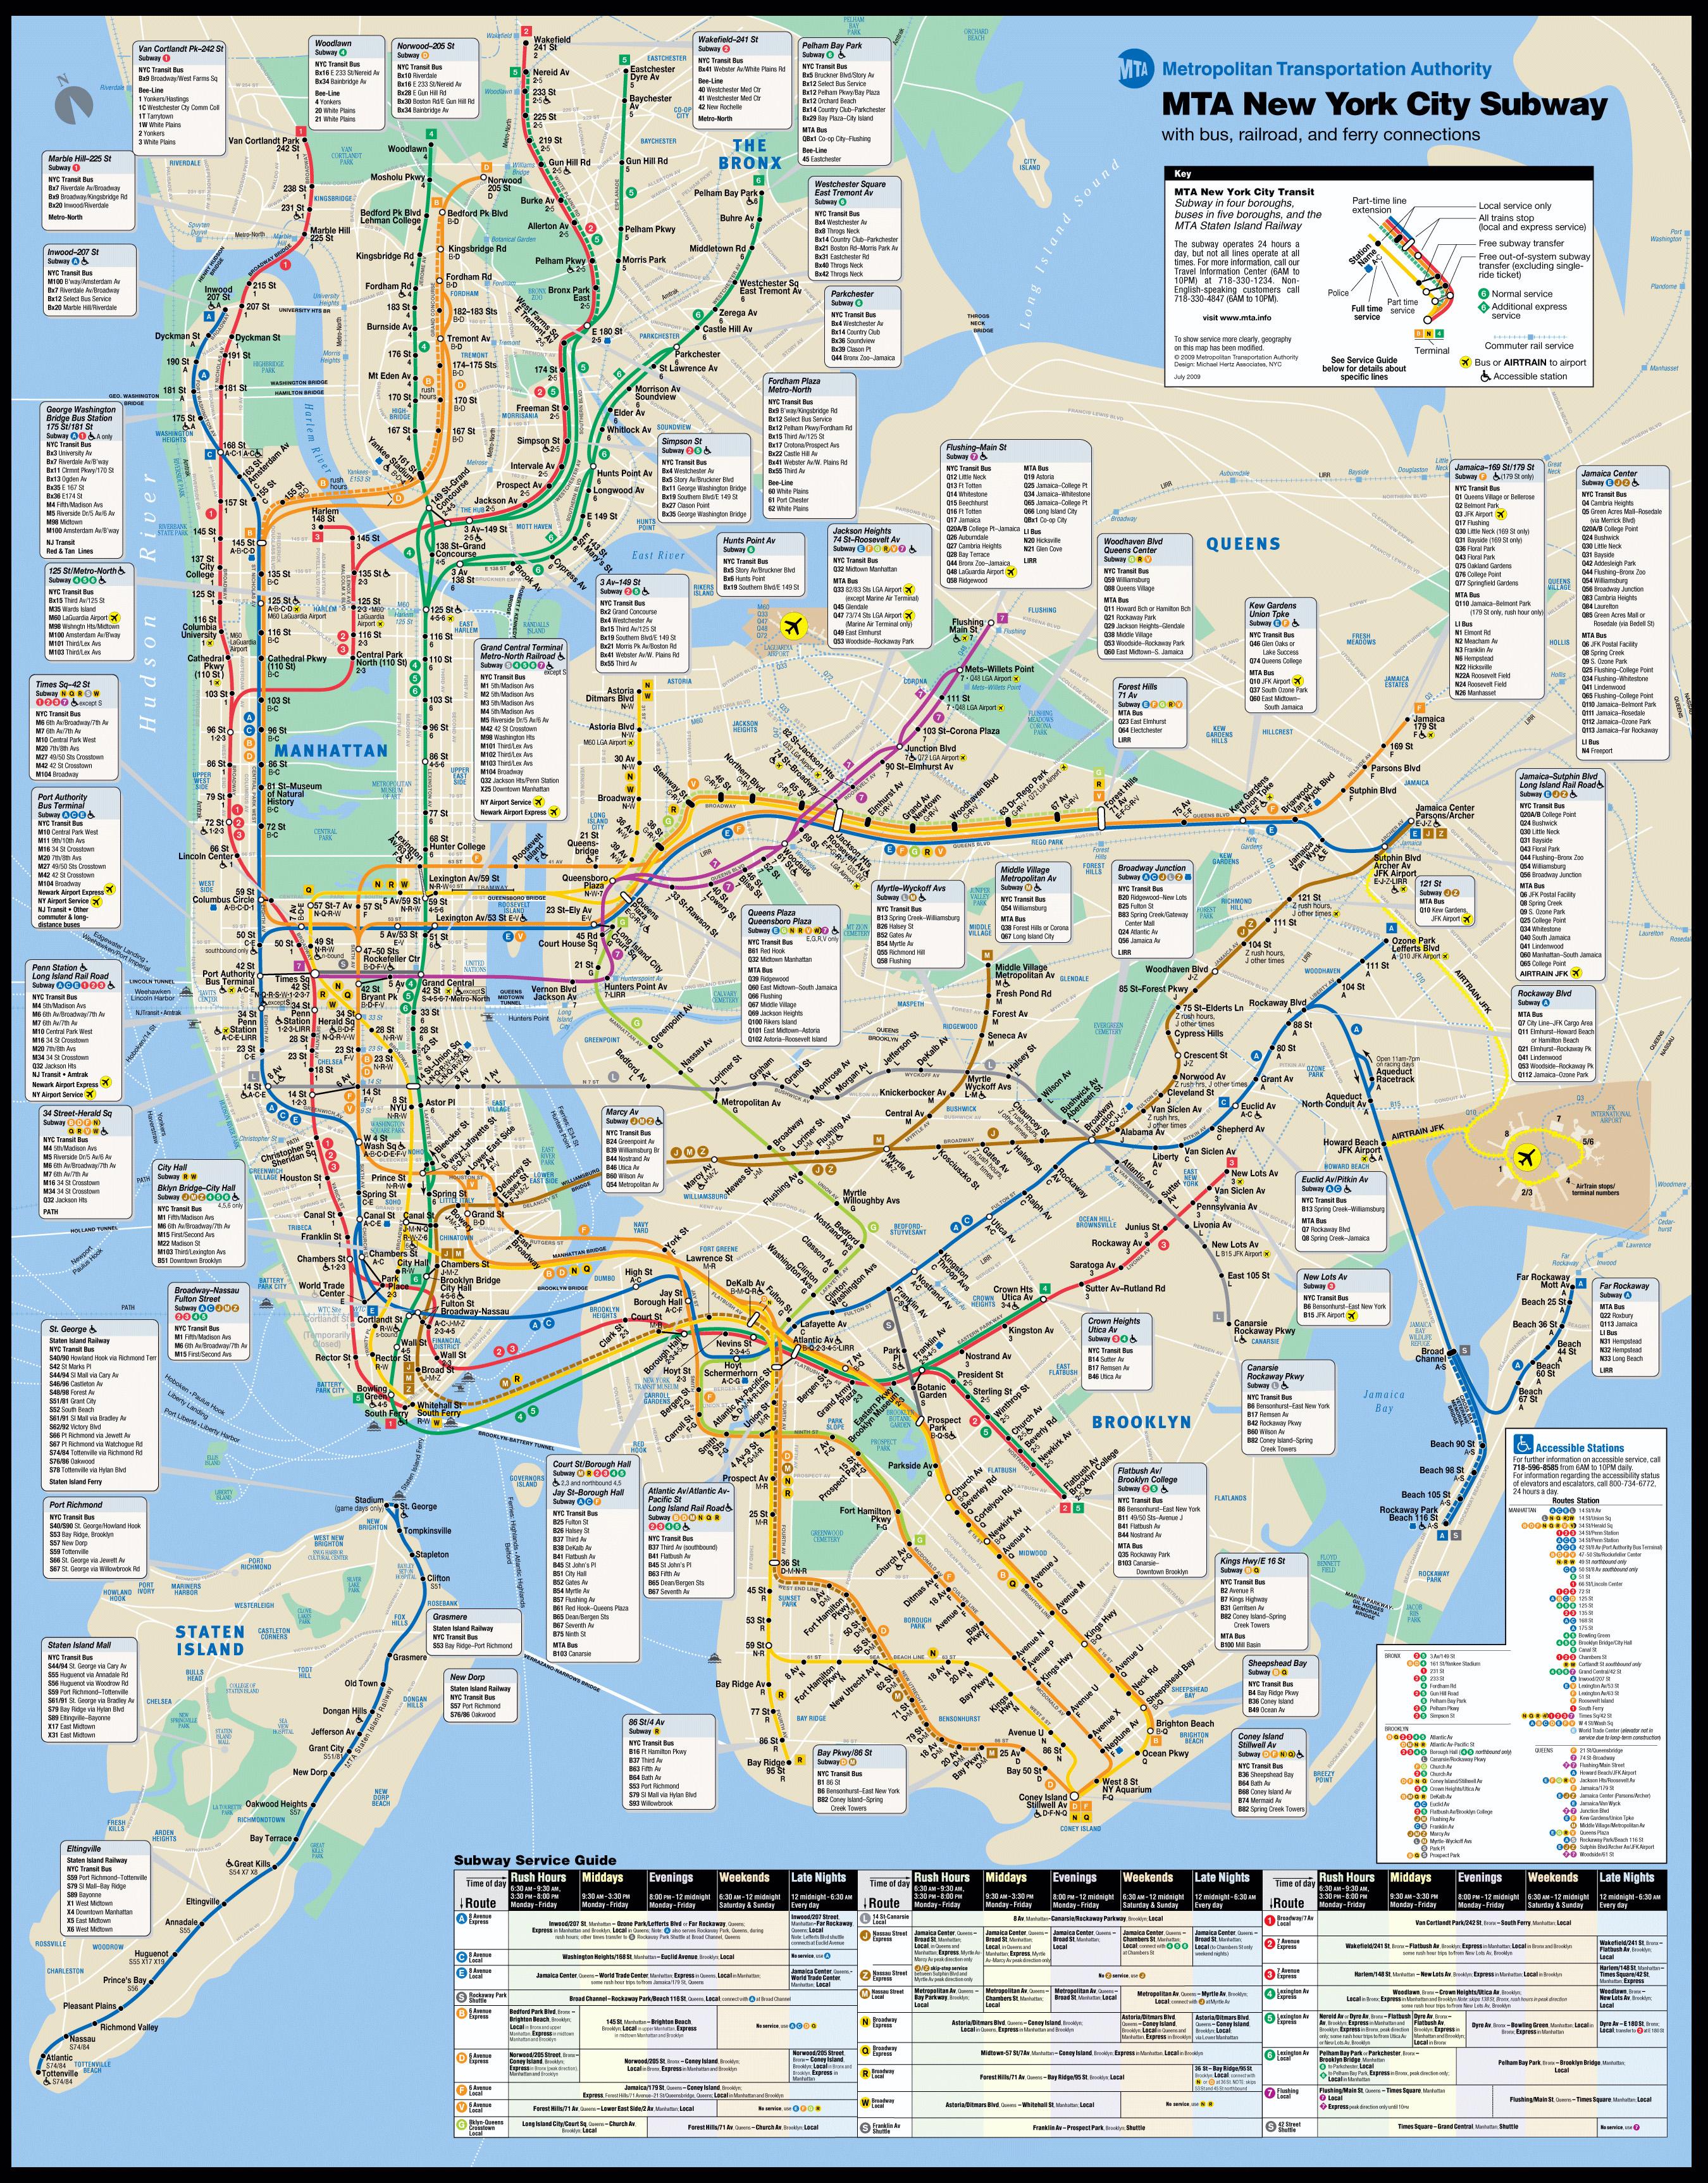 New York City Subway Map Large.Large New York City Subway Metro Map New York Usa United